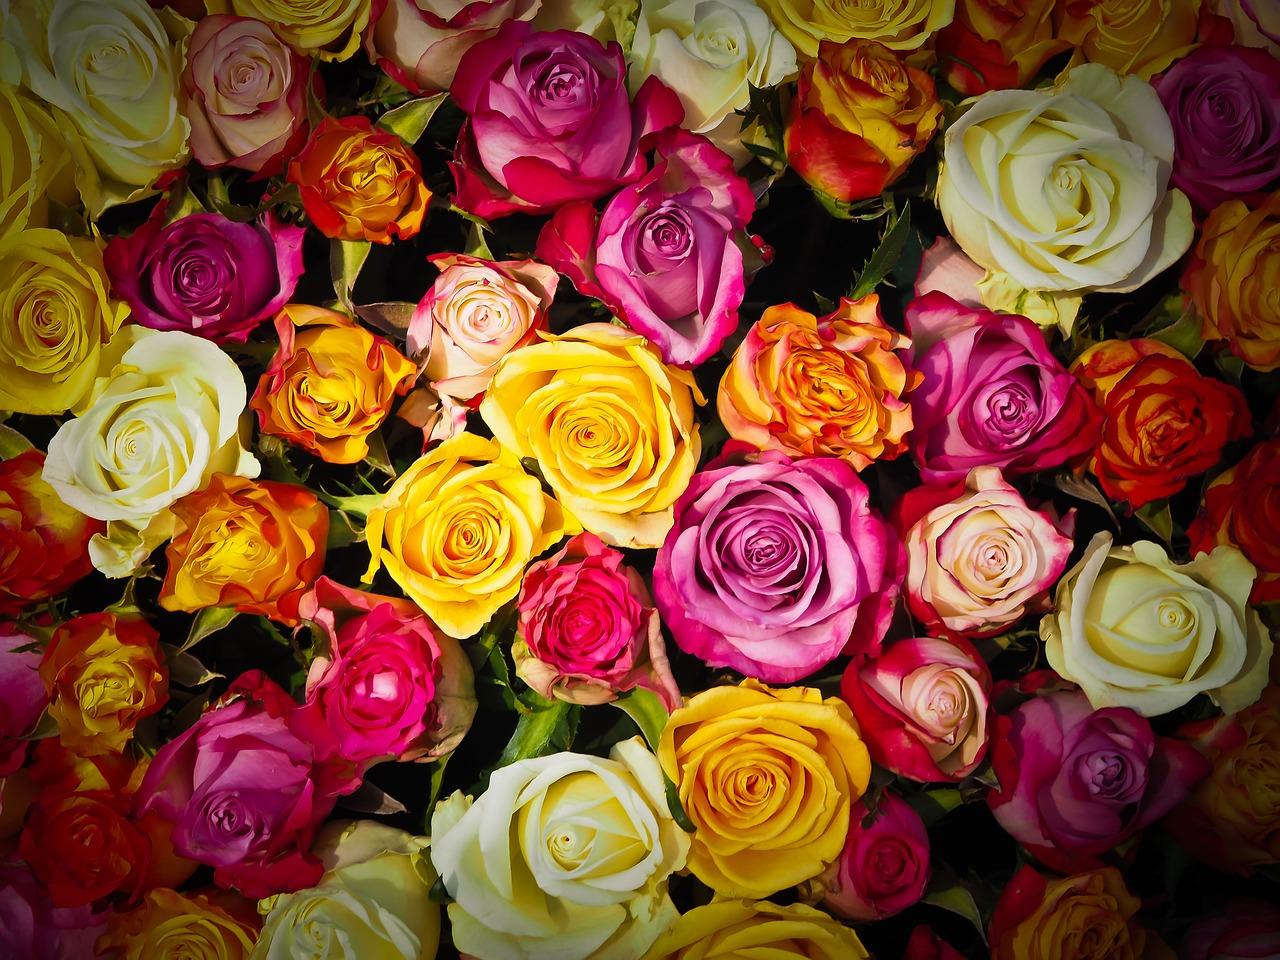 6 Benefits Of Shopping At International Online Florist Store